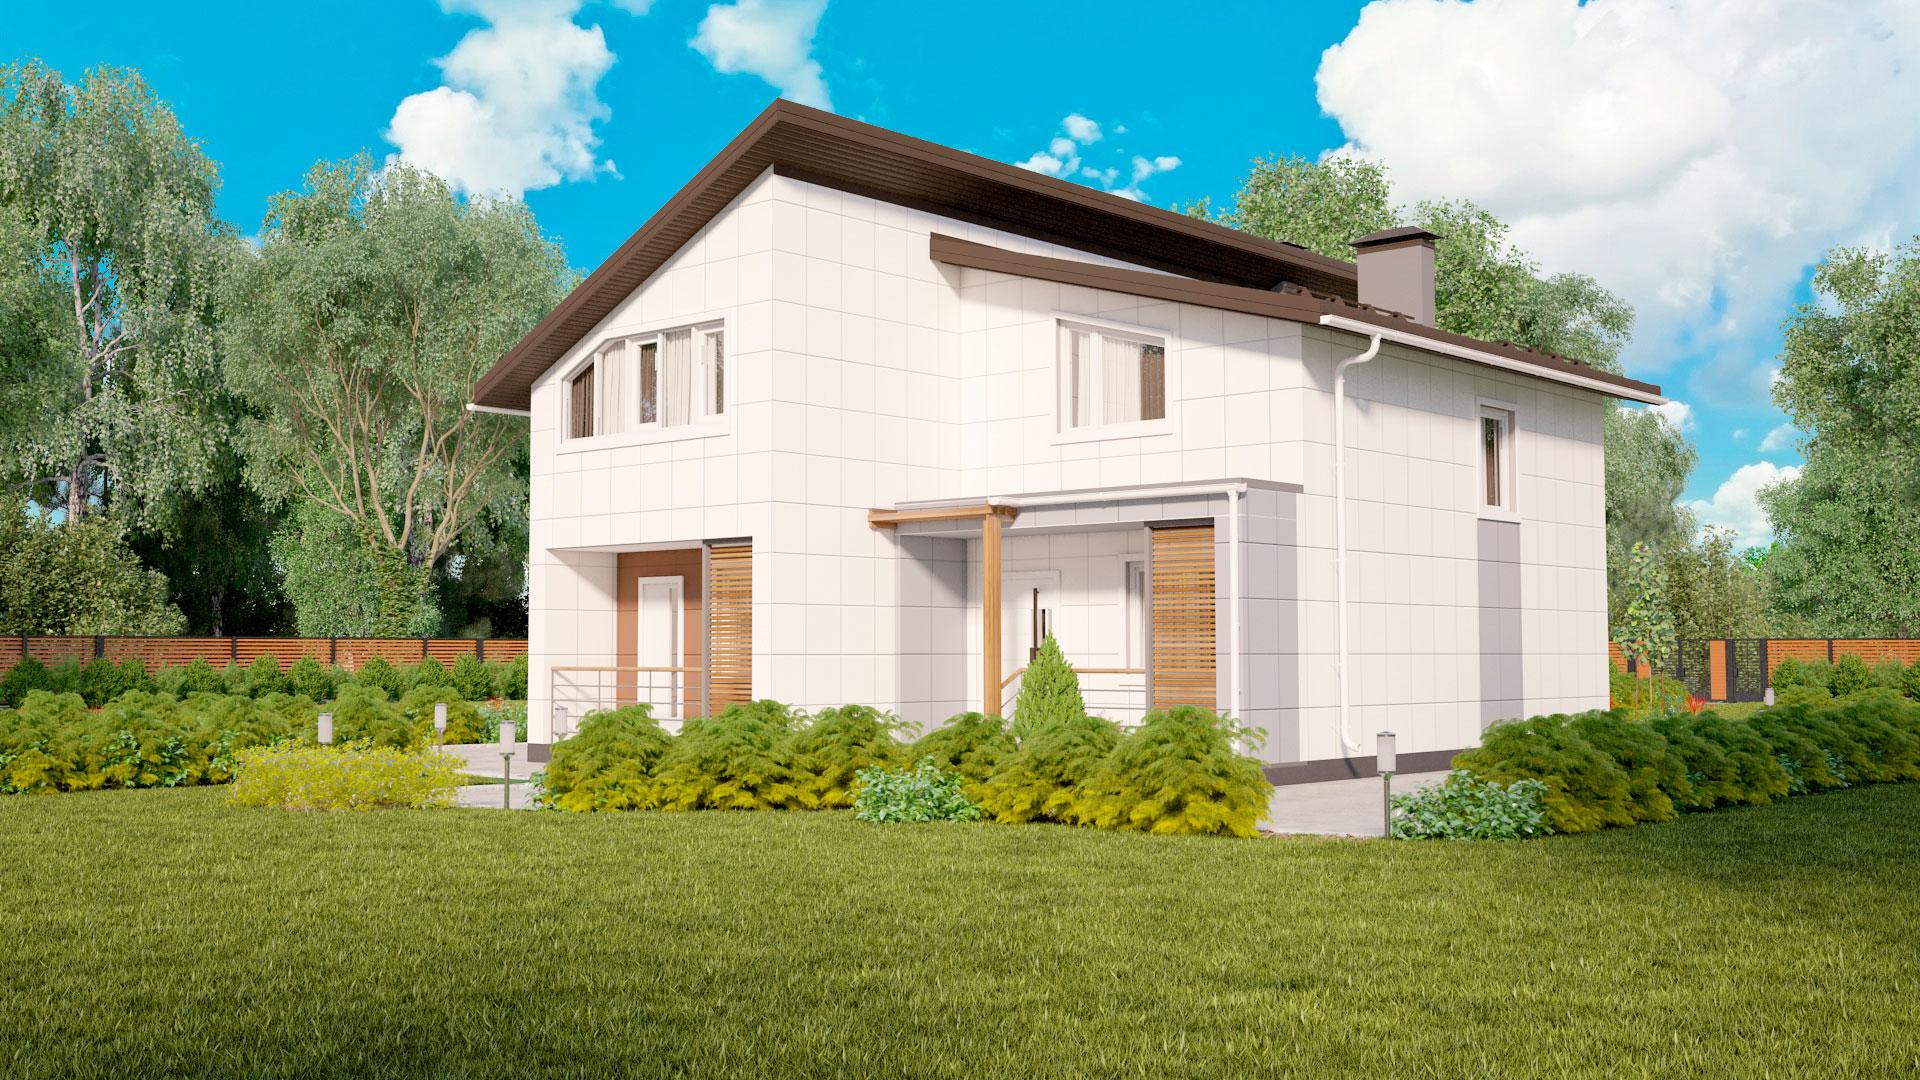 Фасад двухэтажного загородного дома БЭНПАН, проект МС-253/1.